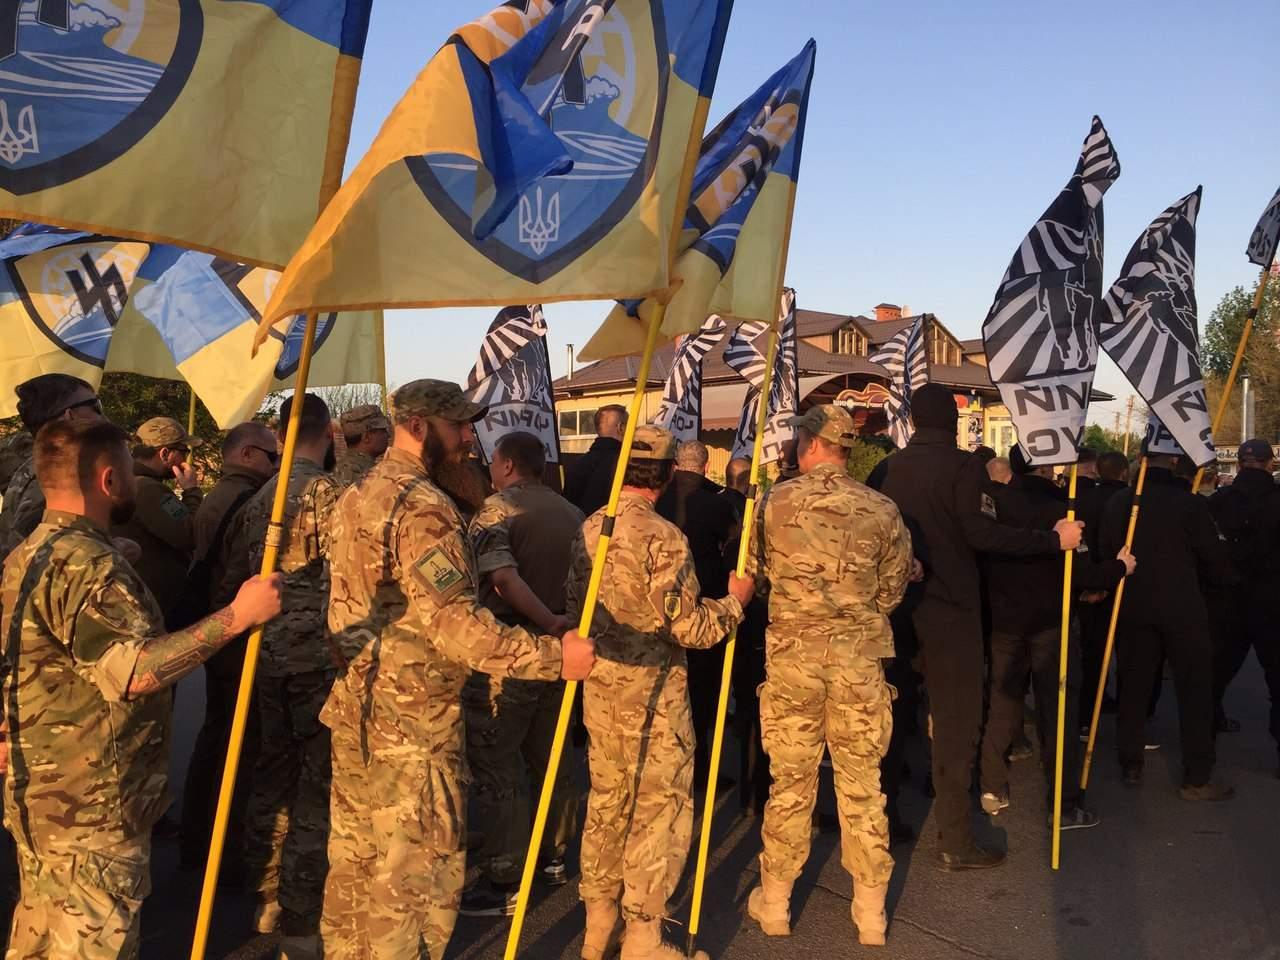 В Бердянске к третей годовщине основания полка АЗОВ прошел марш (Фото)